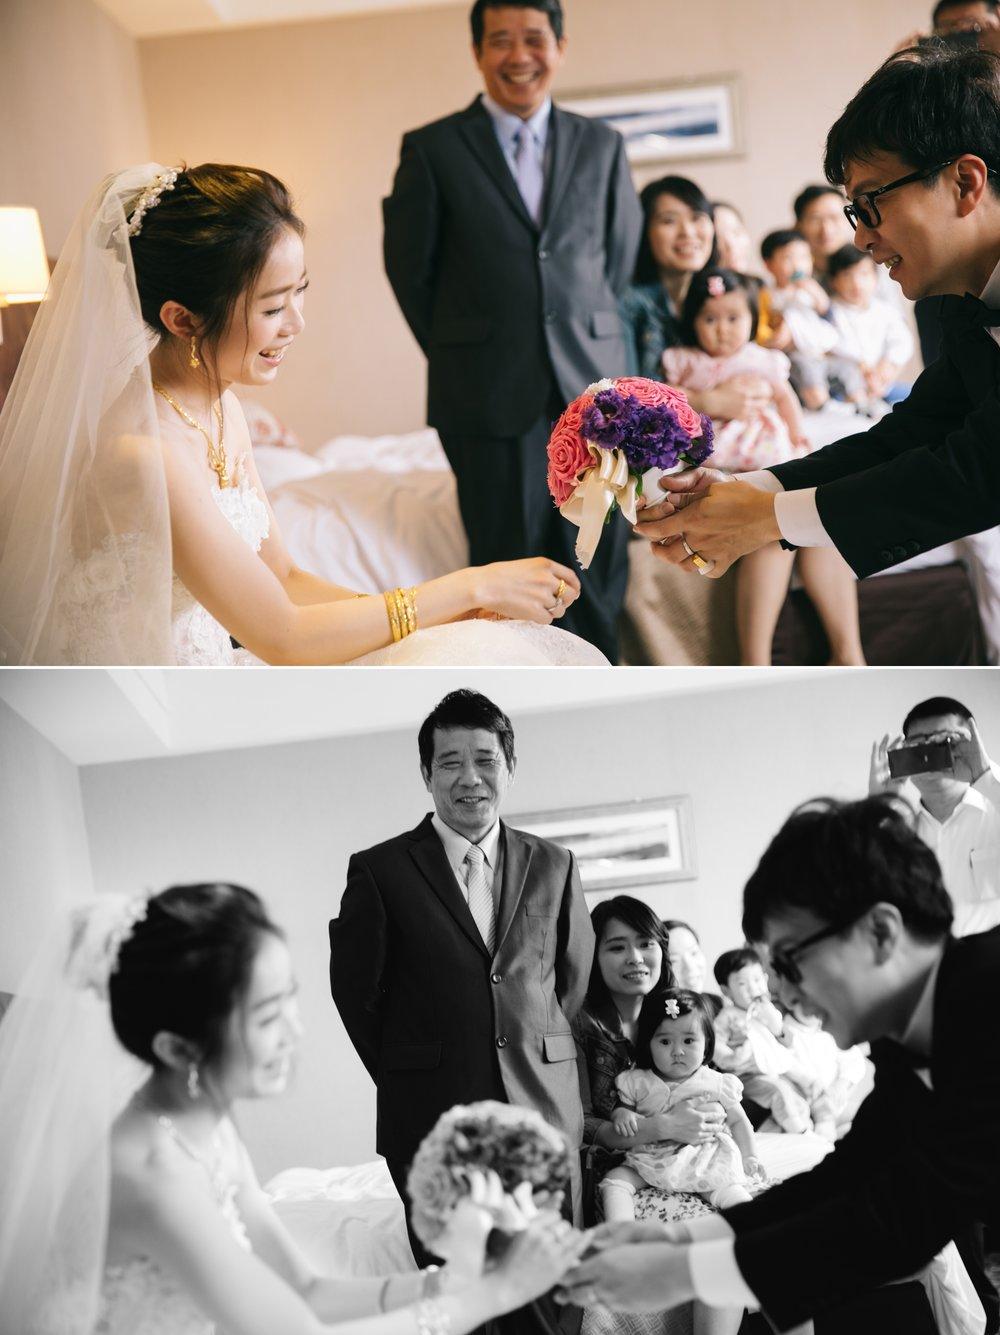 Tina+Nash-wedding-台北婚禮迎娶晚宴-新莊終身大事-057.jpg